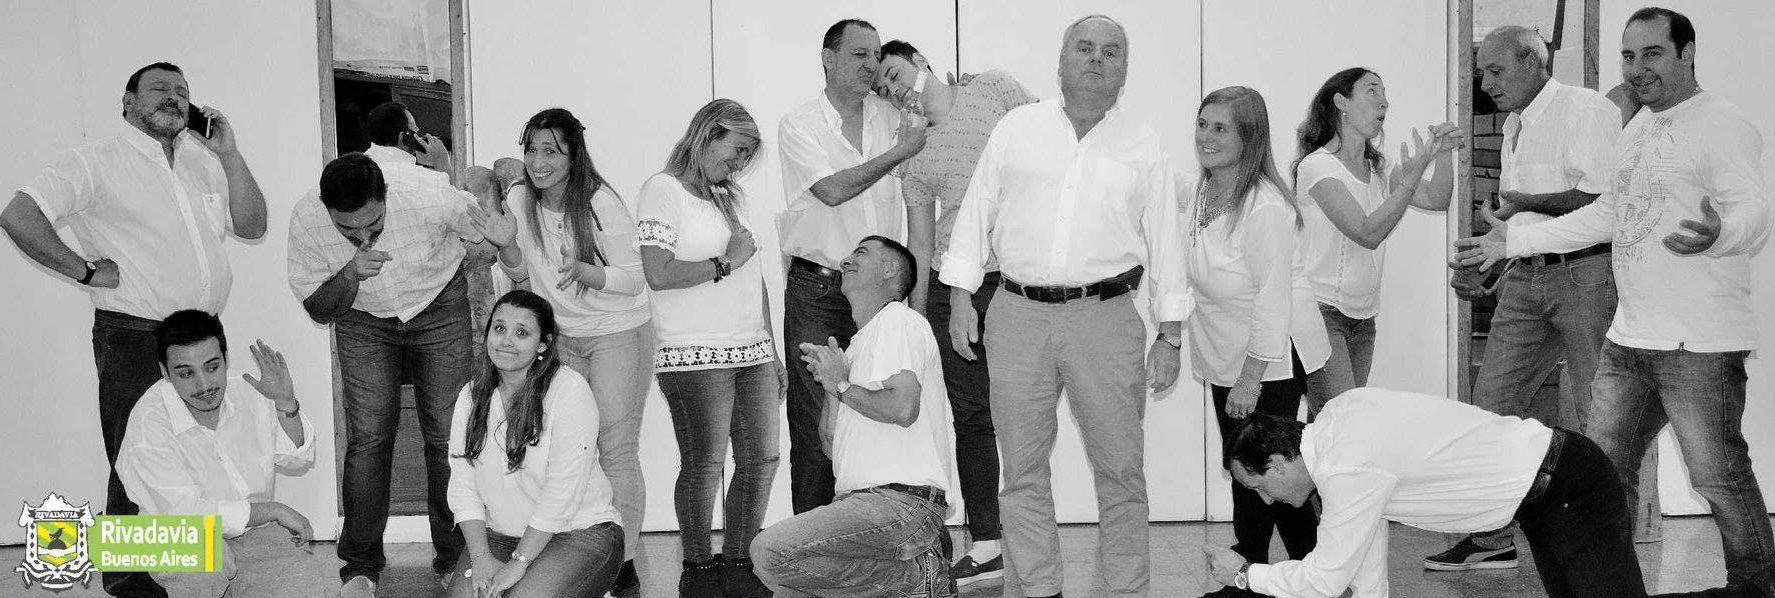 TEATRO SOLIDARIO A BENEFICIO DE BOMBEROS VOLUNTARIOS DE RIVADAVIA